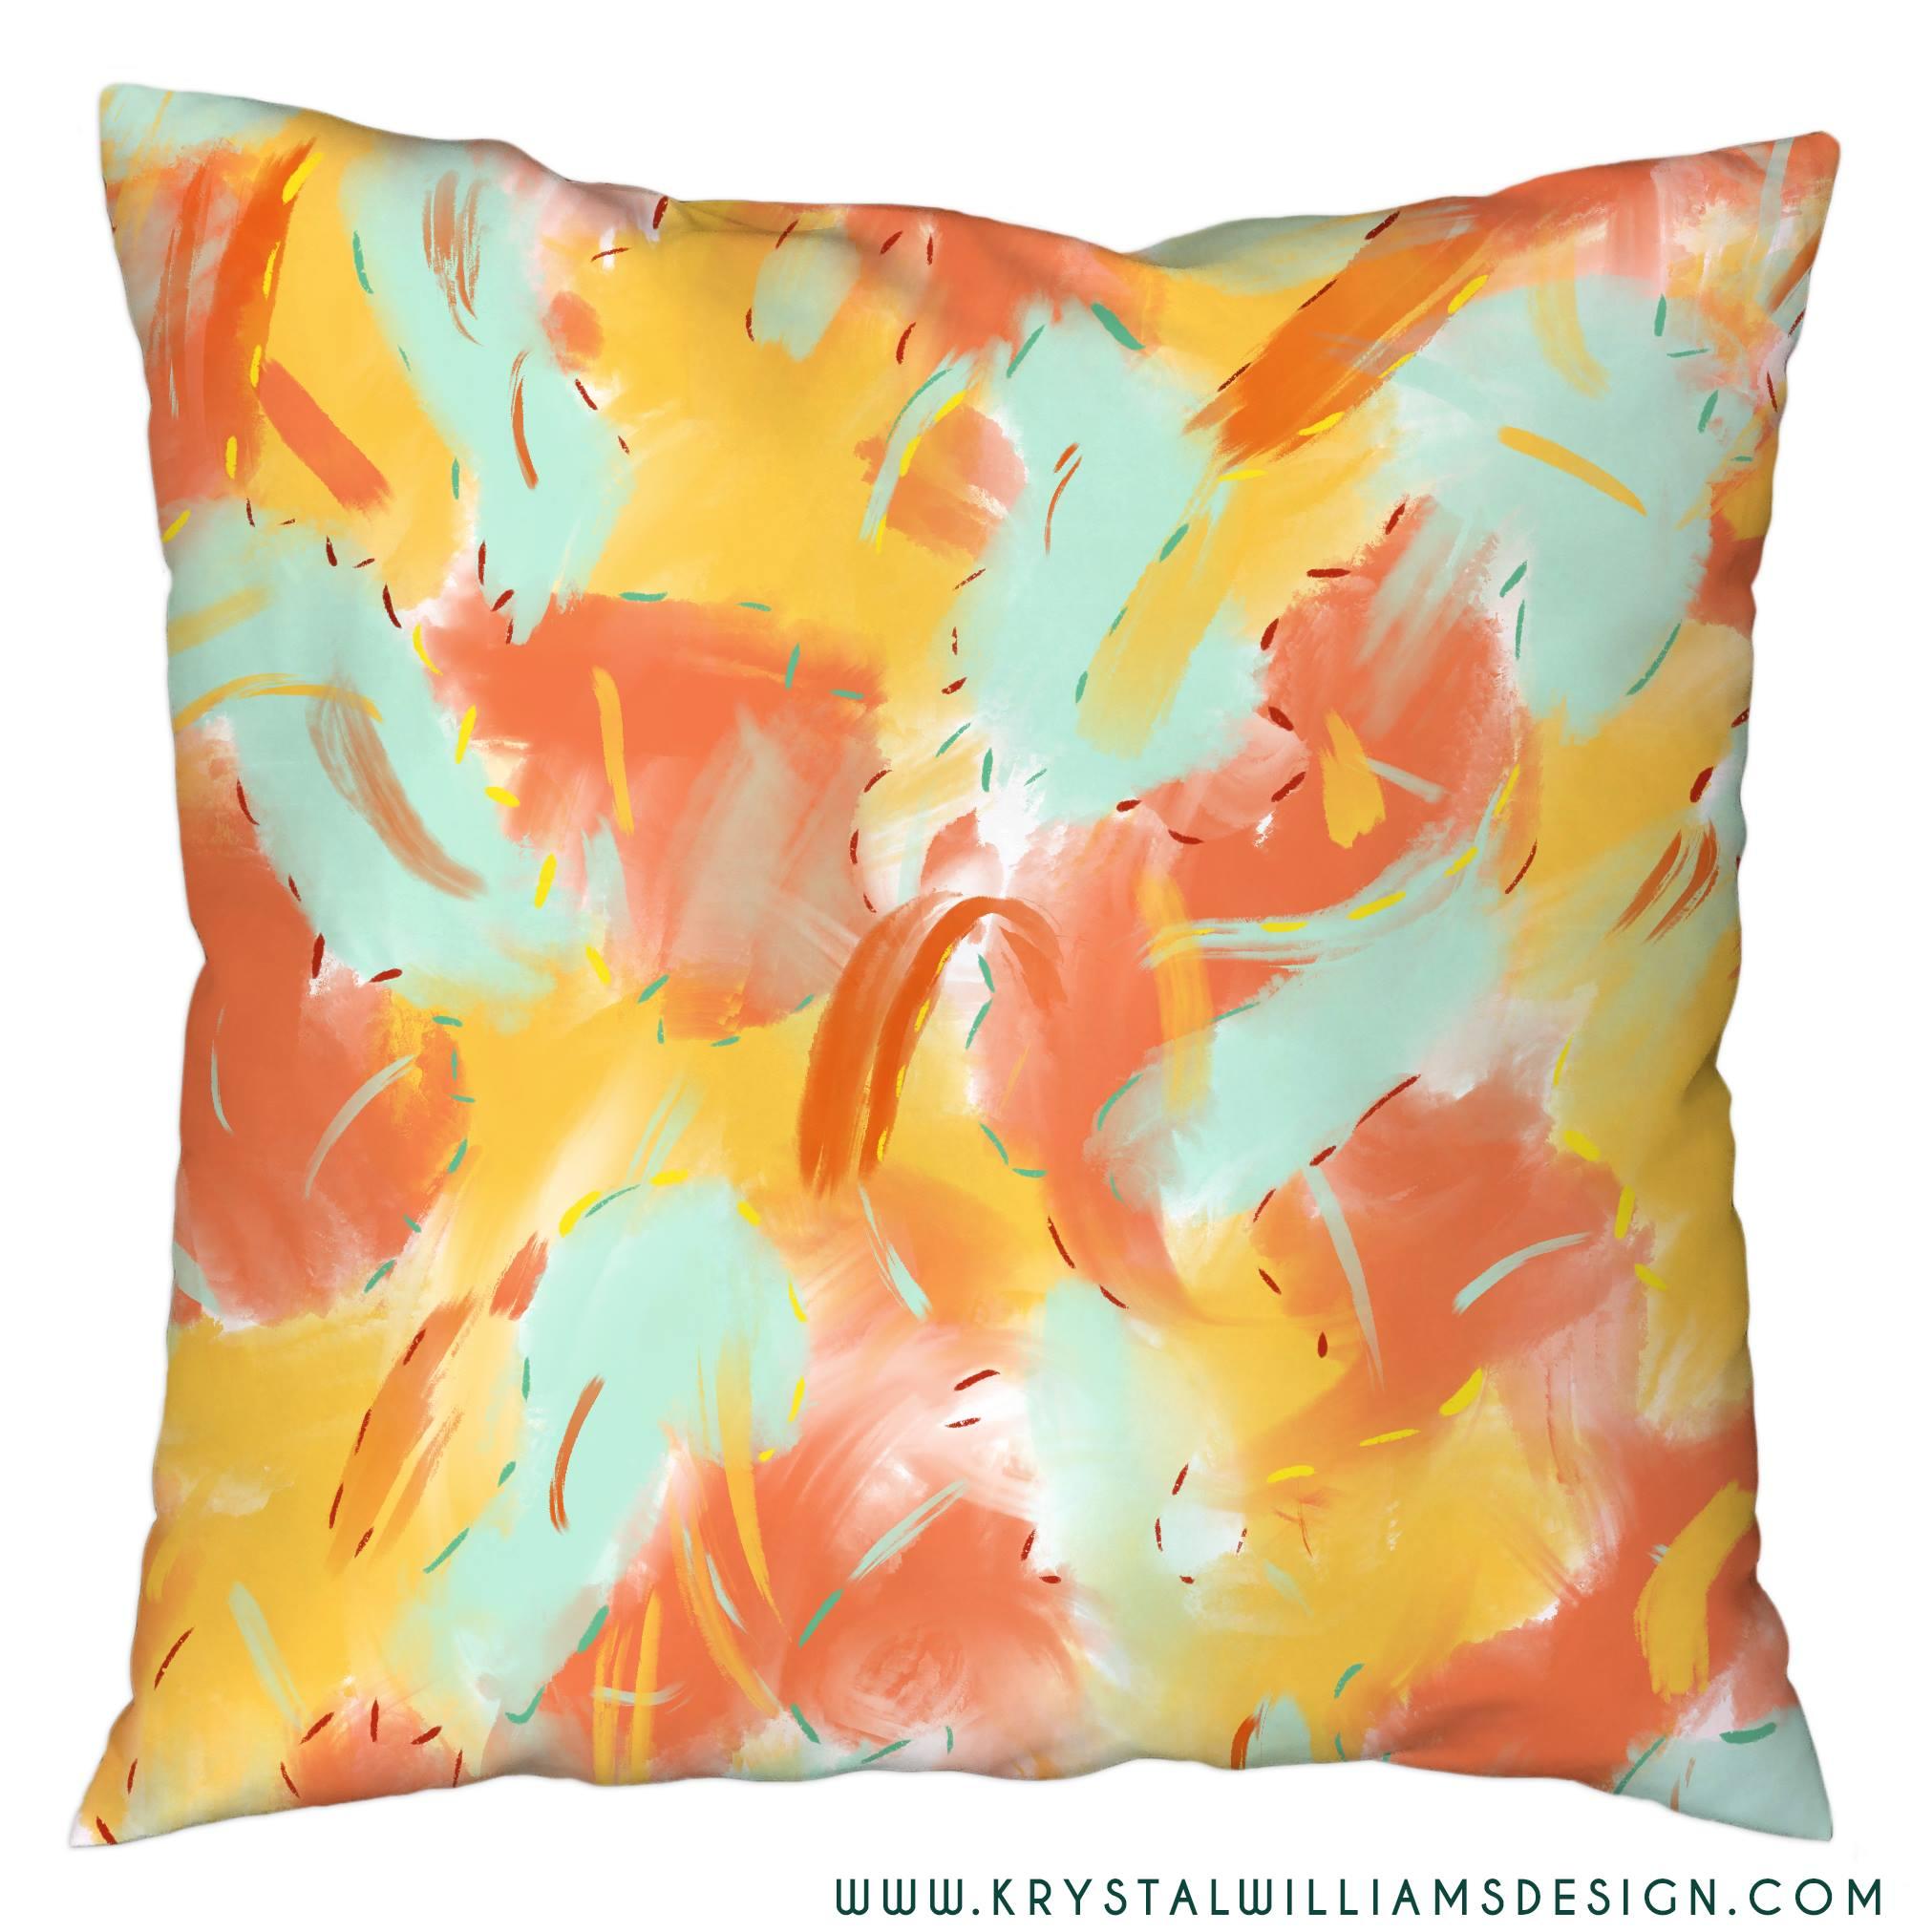 krystal williams abstract cushion.jpg